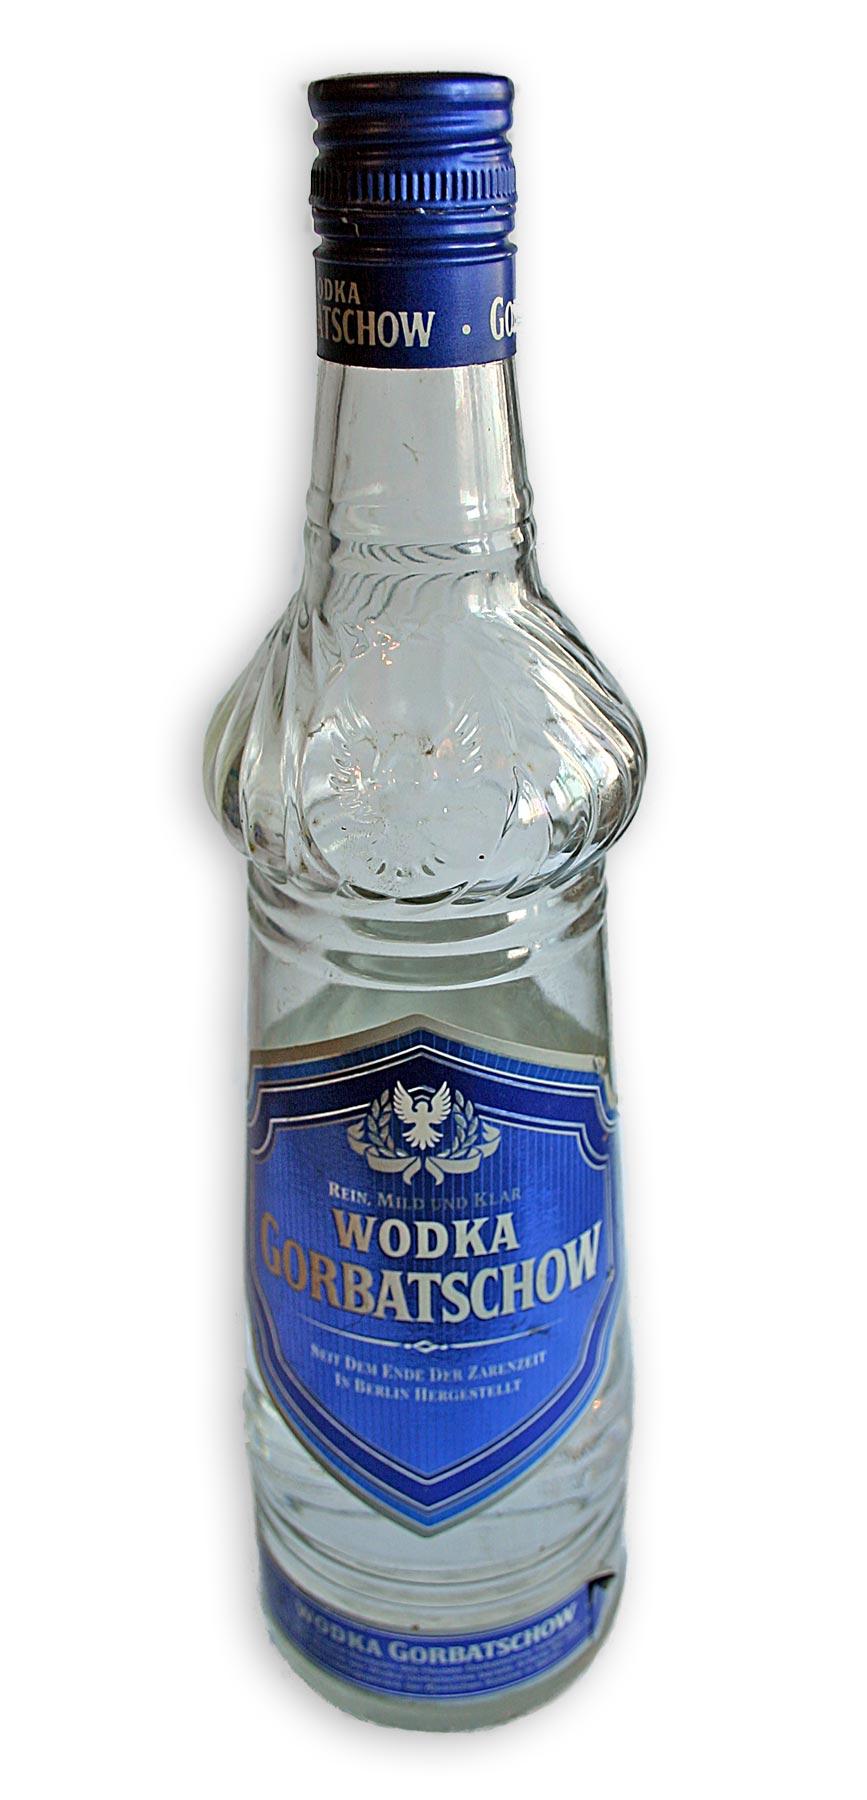 kaisers berlin 0 7 l wodka gorbatschow 37 5 vol f r 6 66 euro. Black Bedroom Furniture Sets. Home Design Ideas